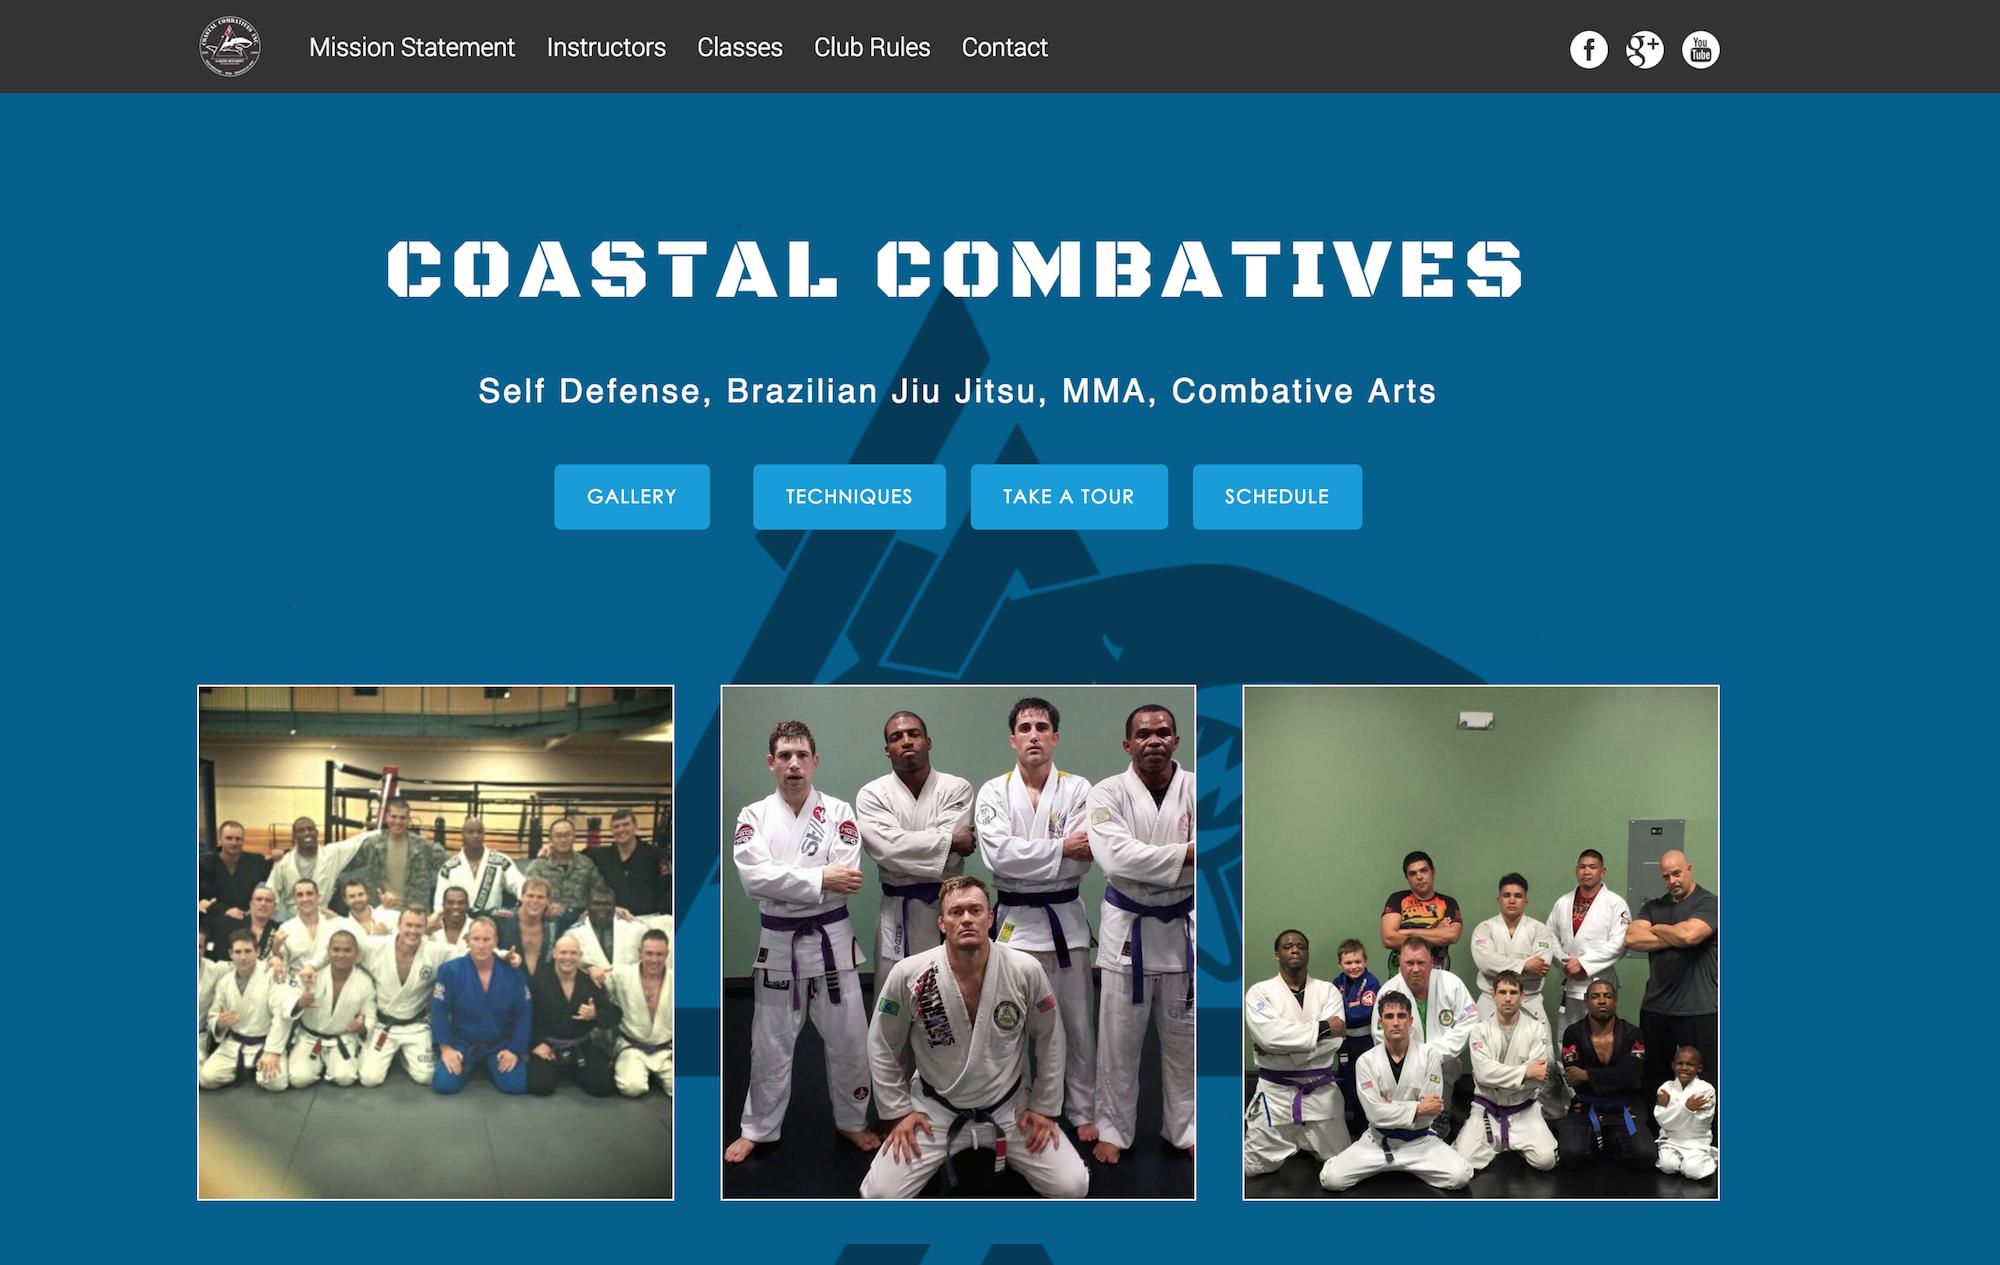 Coastal Combatives – Coastal Combatives